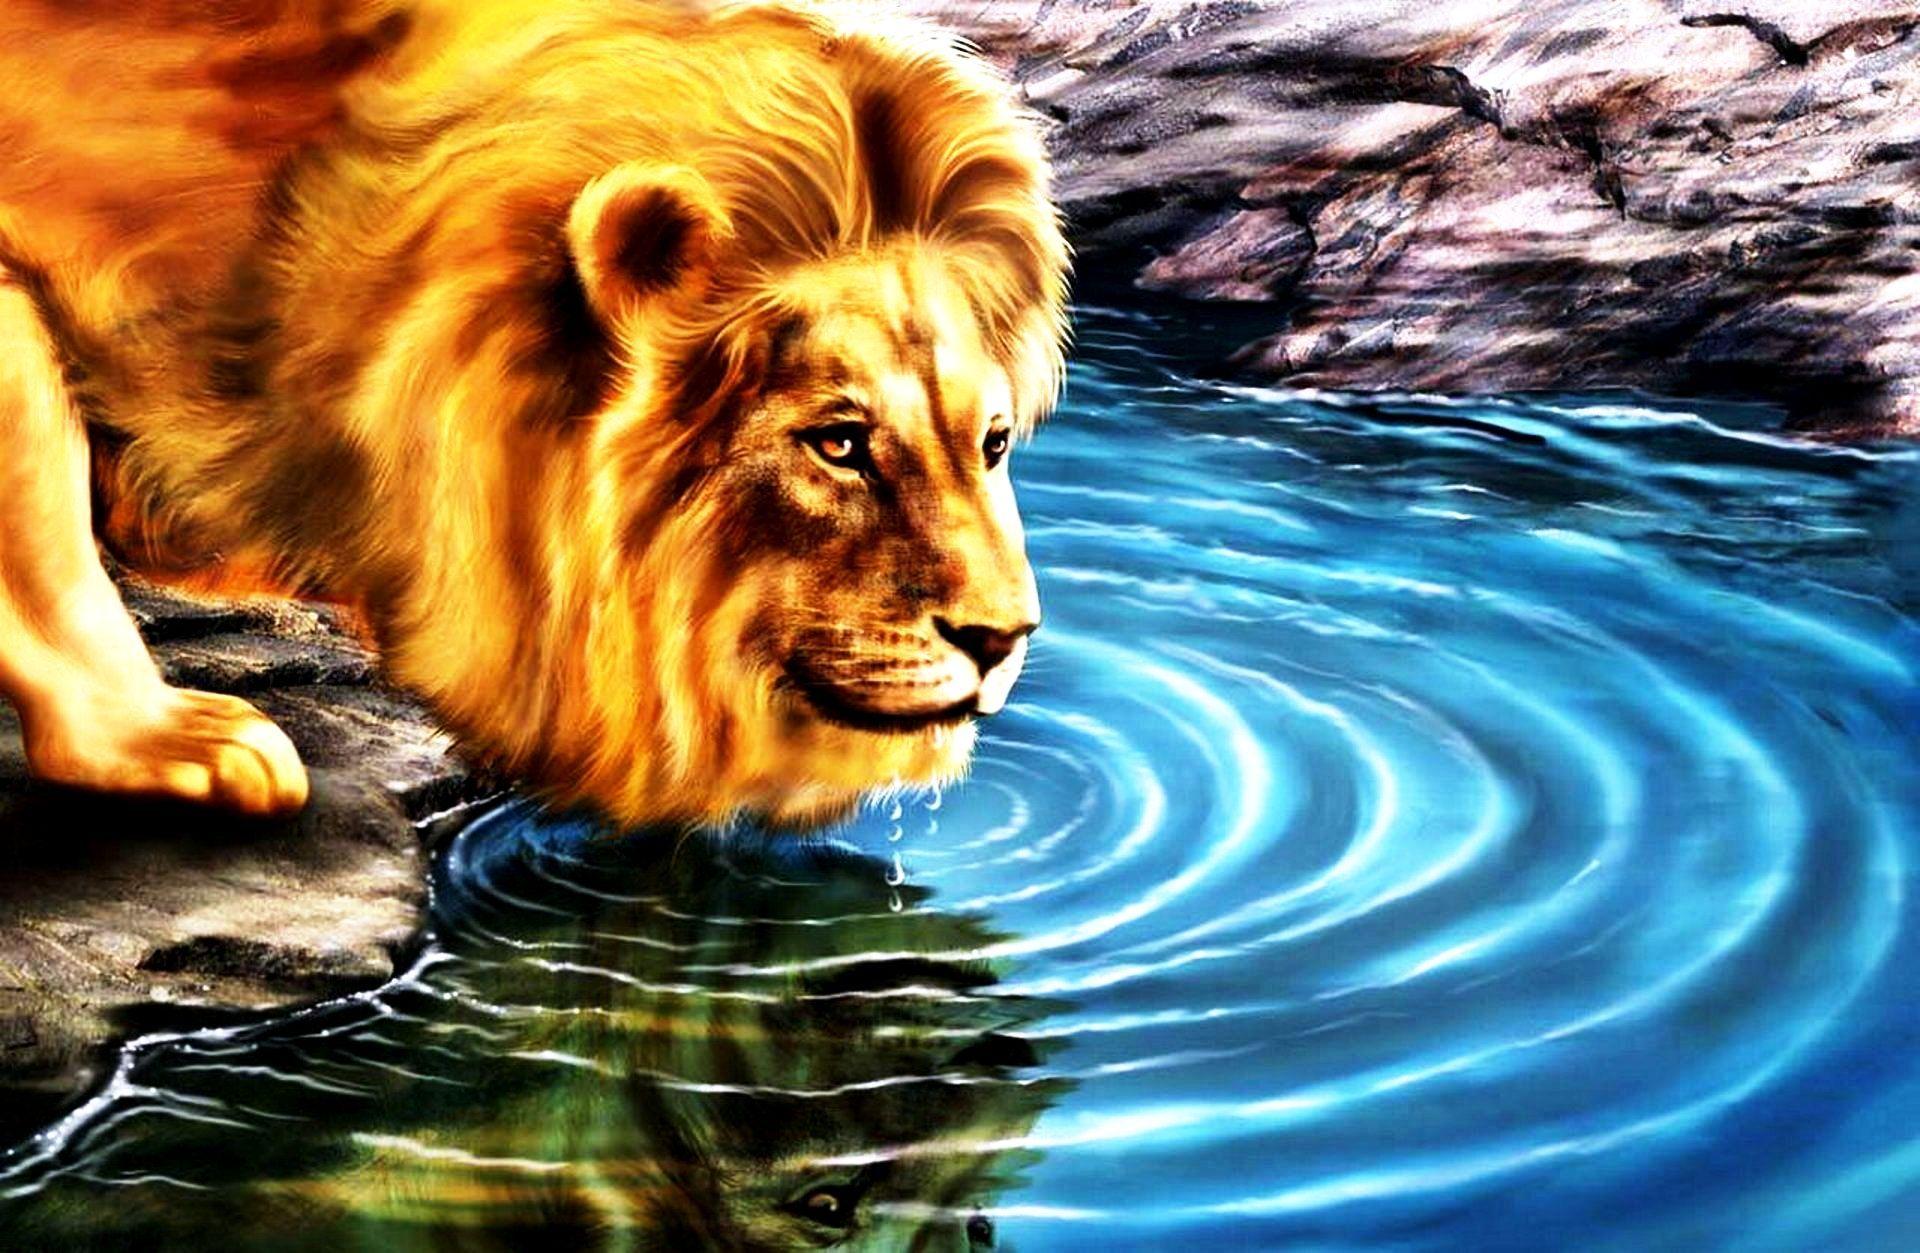 Wallpaper download lion - Undefined Free 3d Wallpaper Downloads 48 Wallpapers Adorable Wallpapers